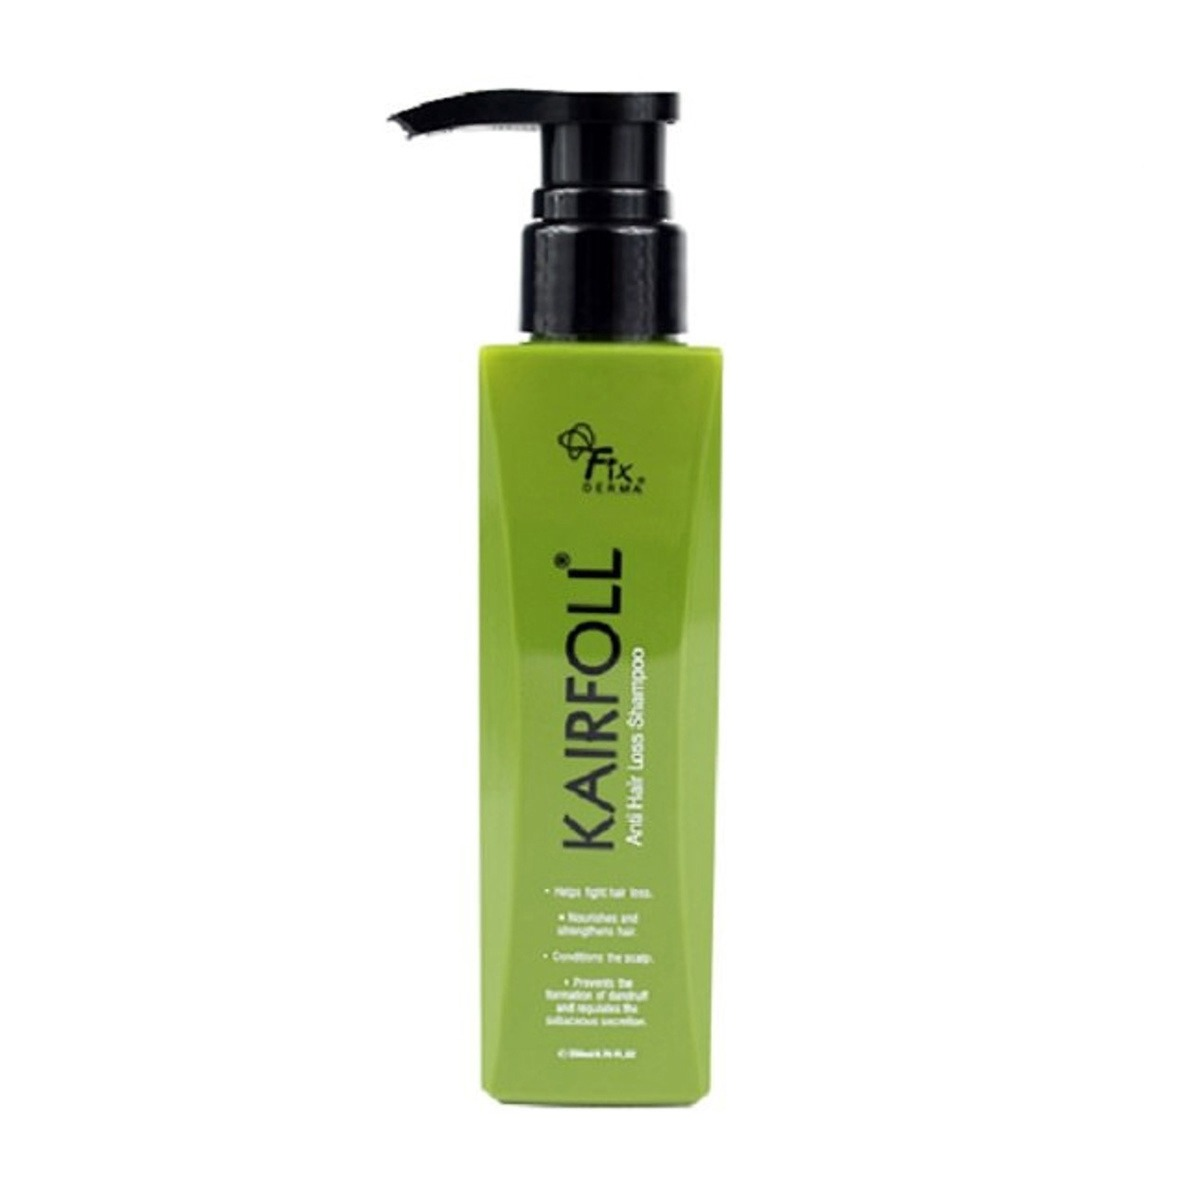 Dầu Gội Trị Rụng Tóc Fixderma Kairfoll Shampoo 200ml